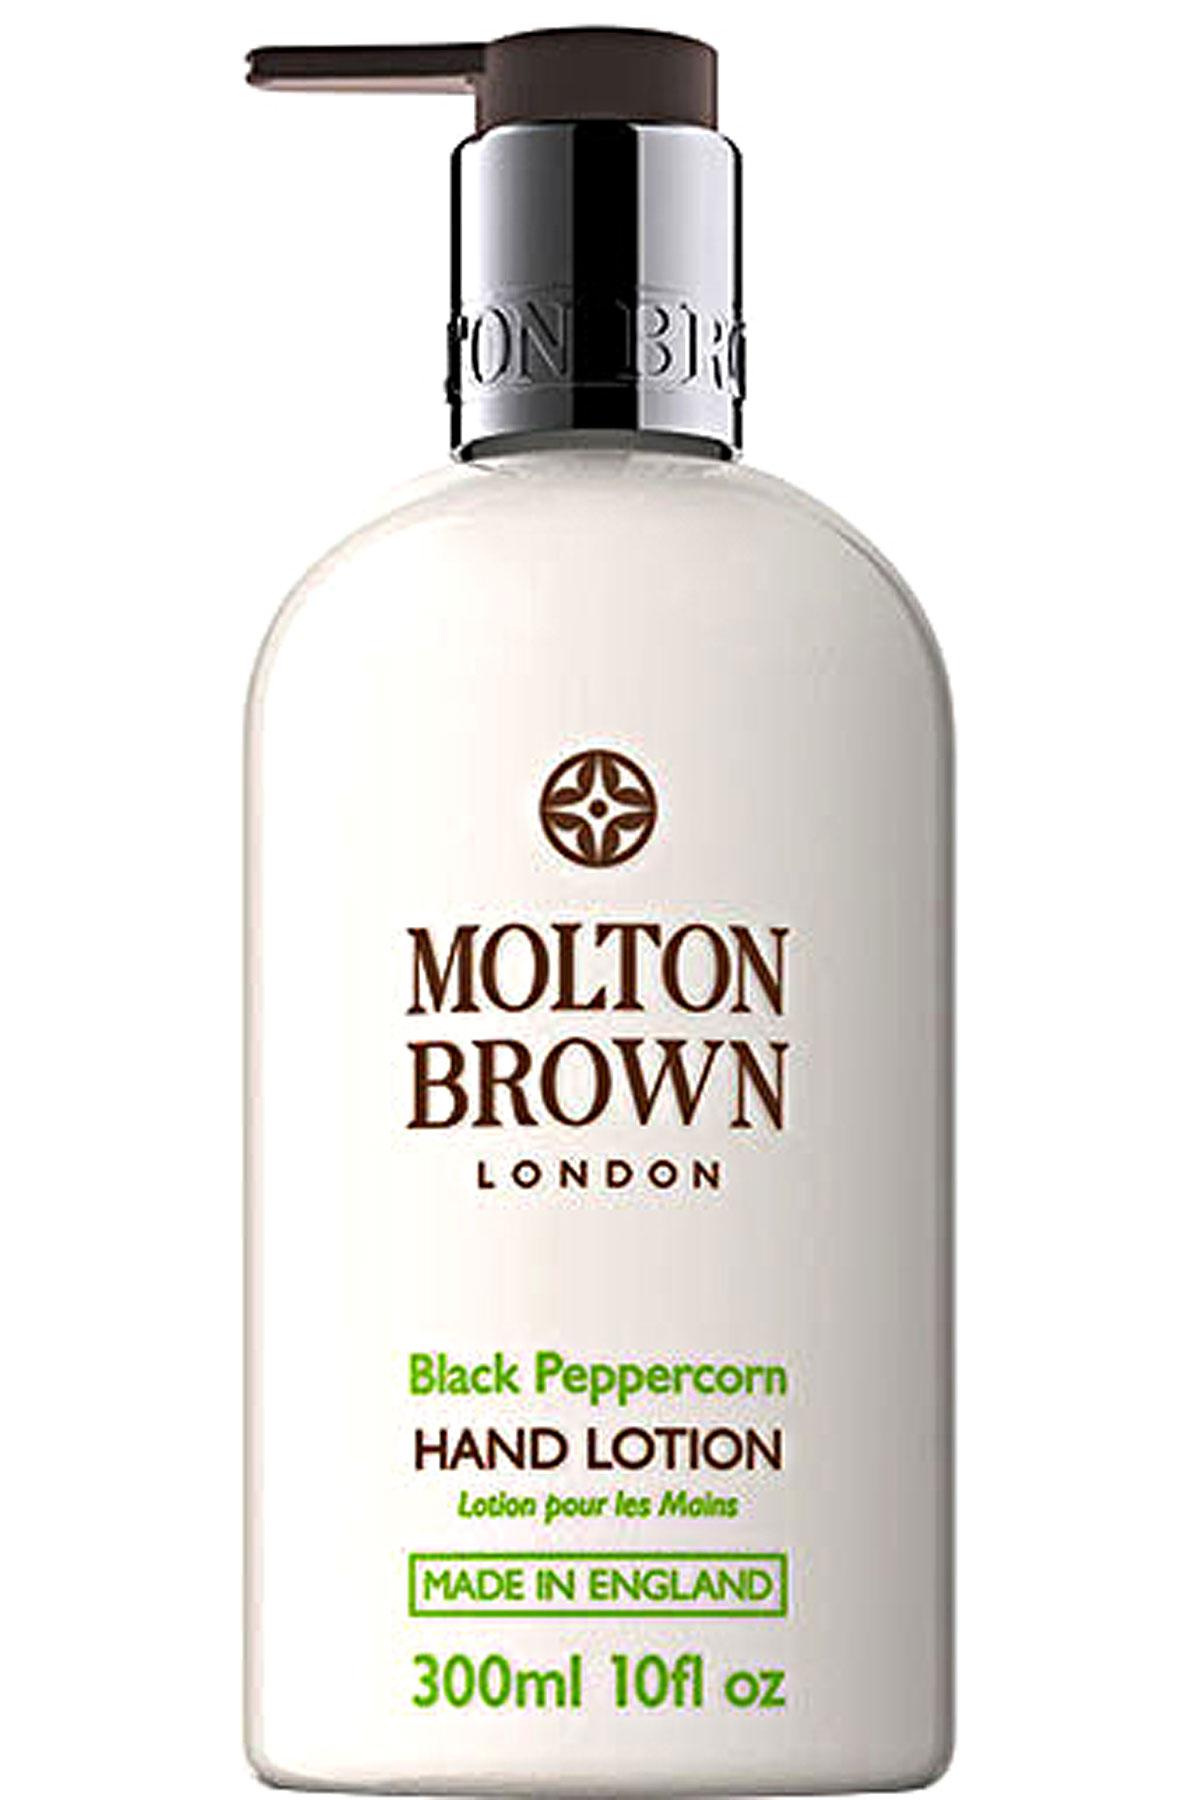 Molton Brown Beauty for Men, Black Peppercorn - Hand Lotion - 300 Ml, 2019, 300 ml